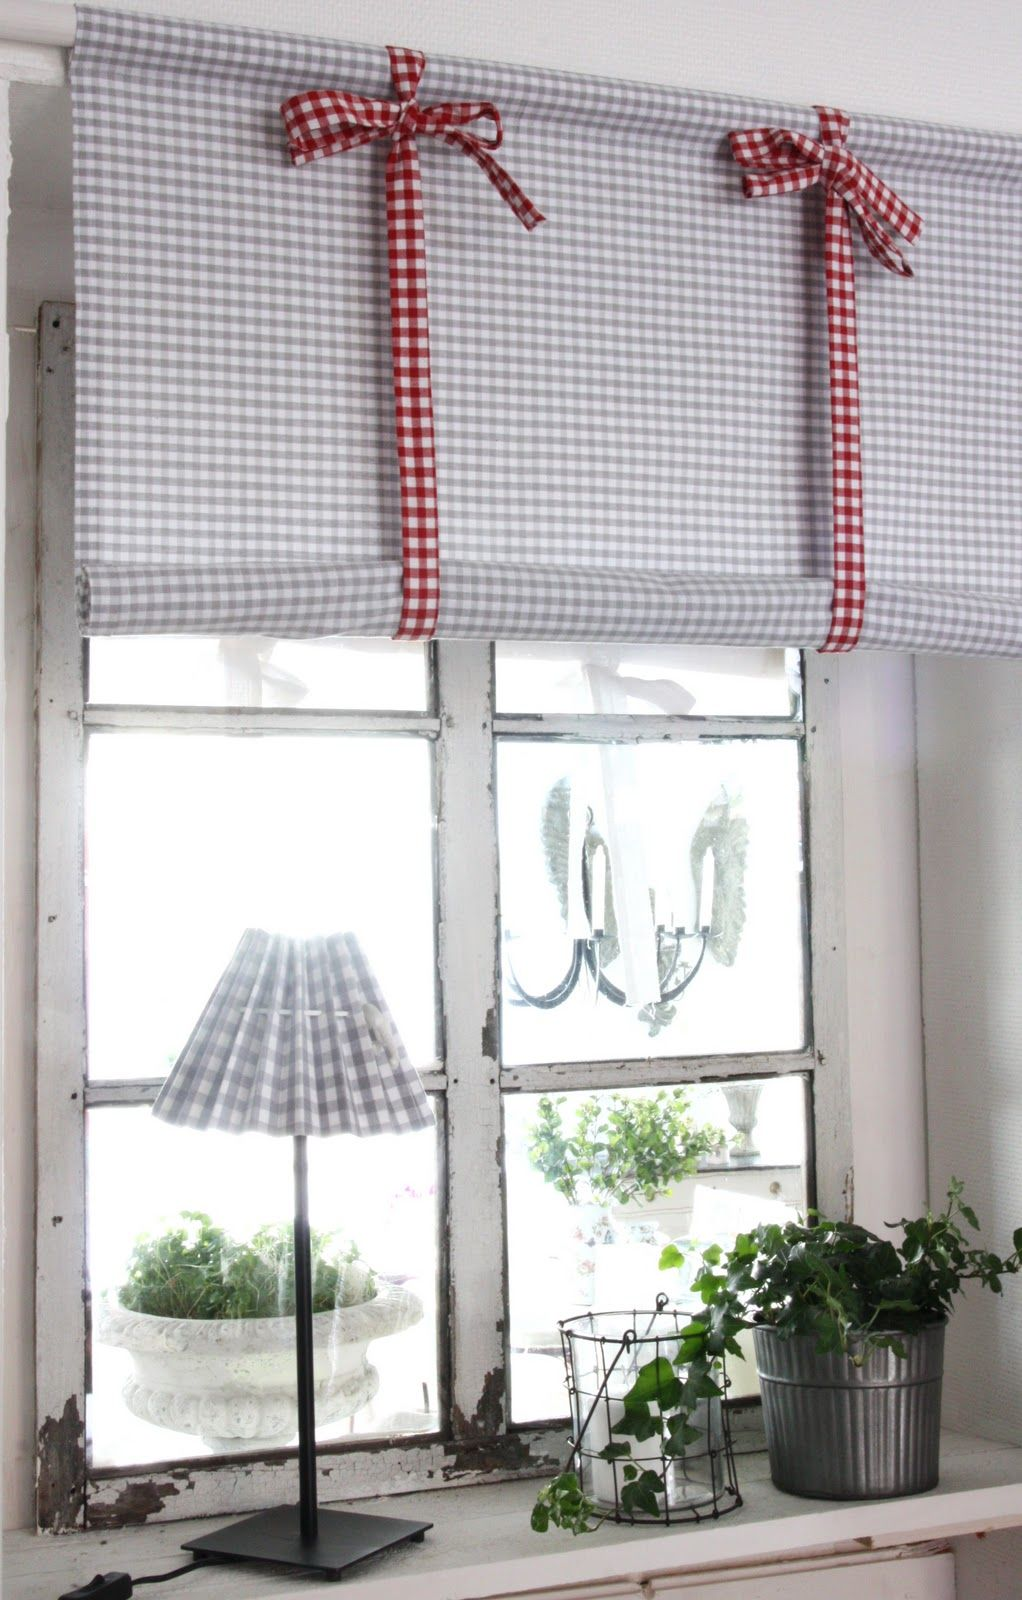 gruvgatan 13 tutorial pinterest gardinen vorh nge und vorh nge gardinen. Black Bedroom Furniture Sets. Home Design Ideas